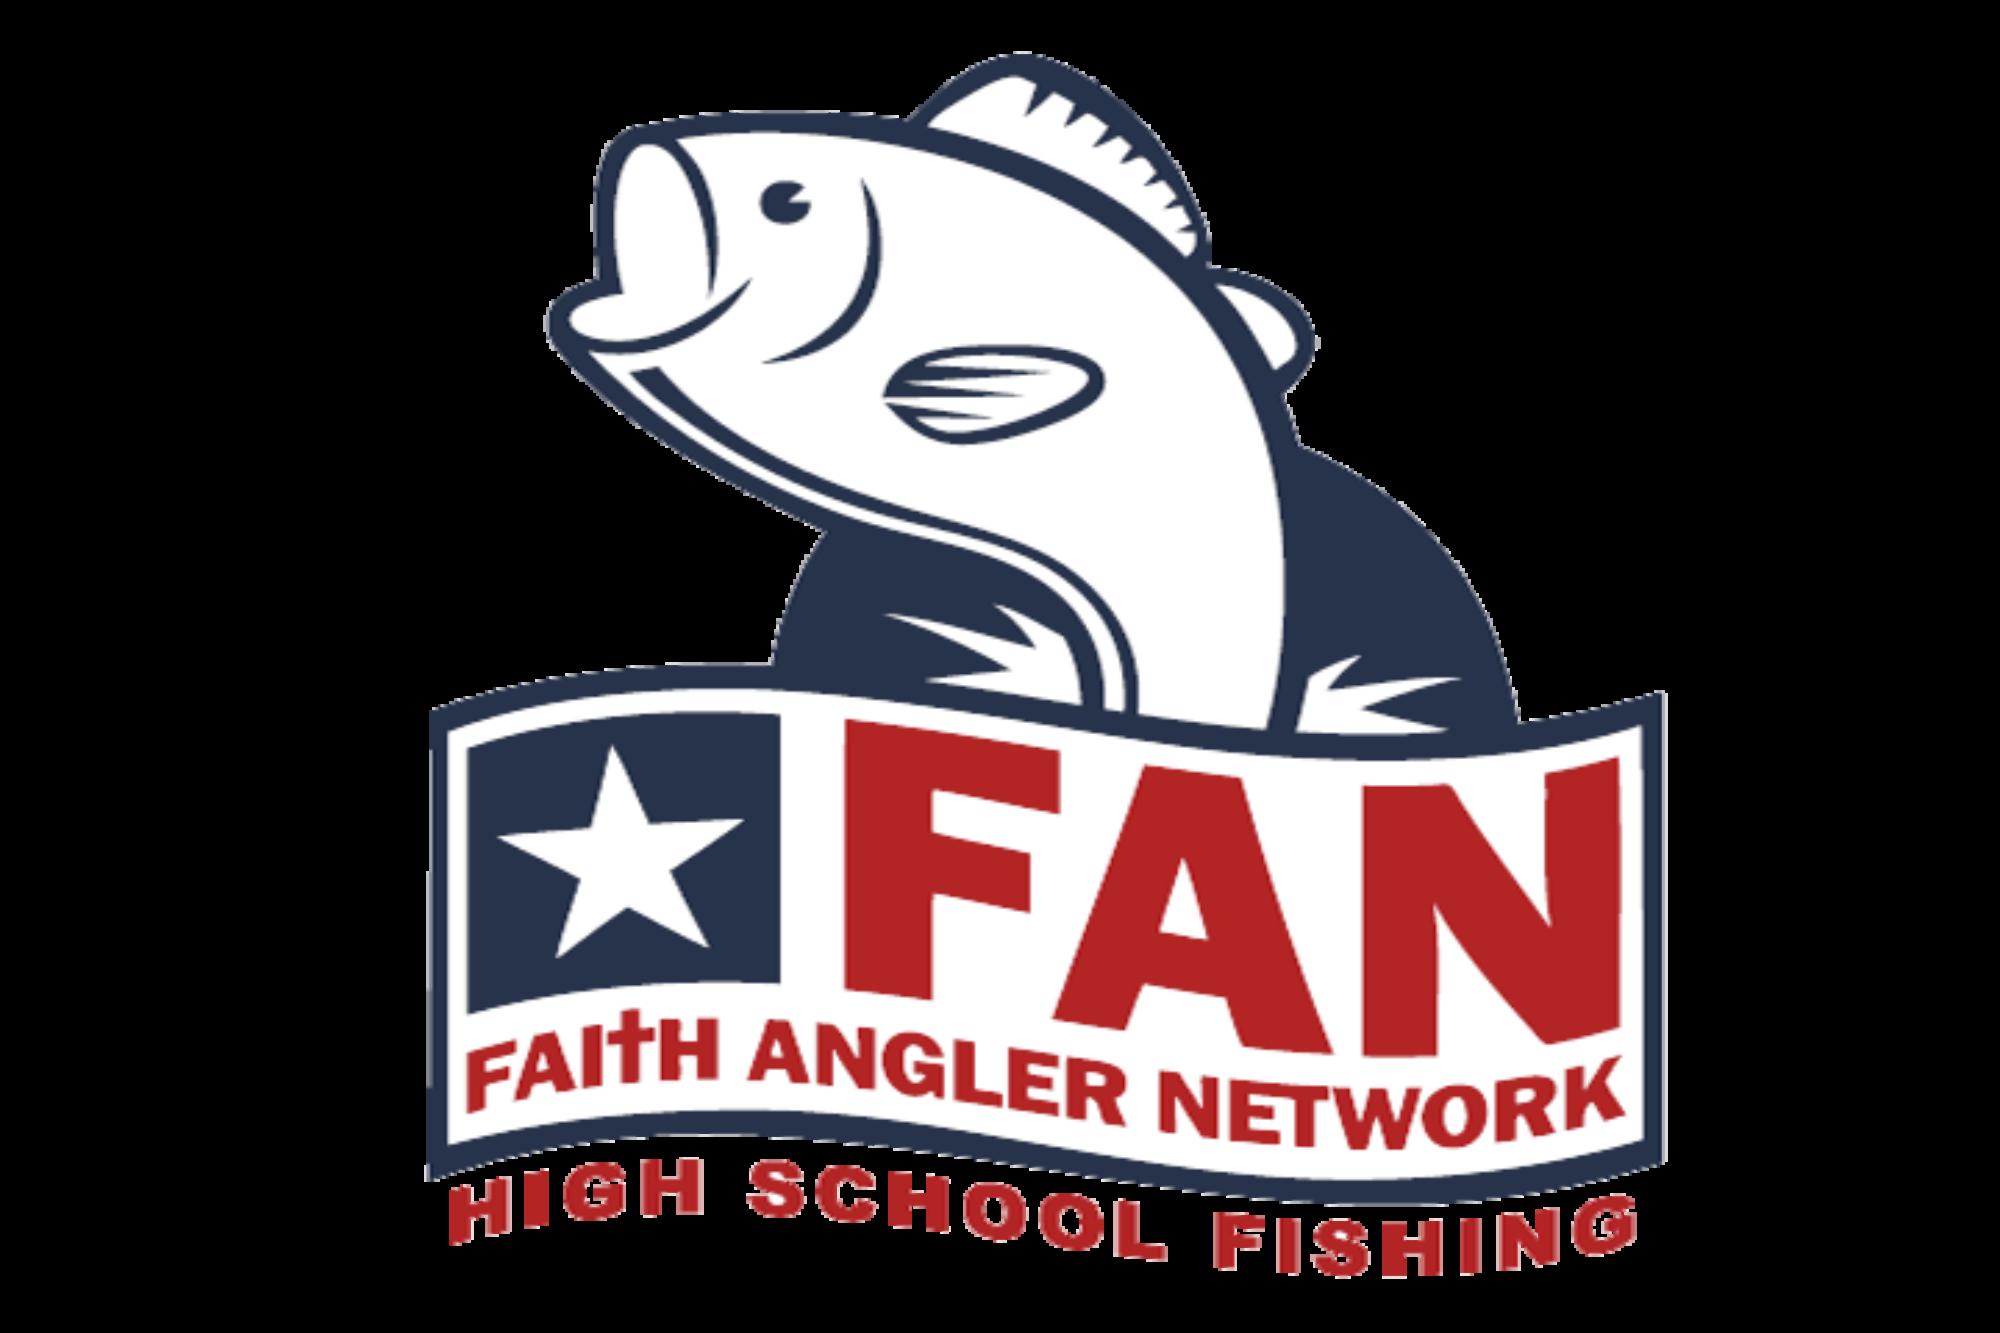 Fan high school fishing. Proud clipart fisherman